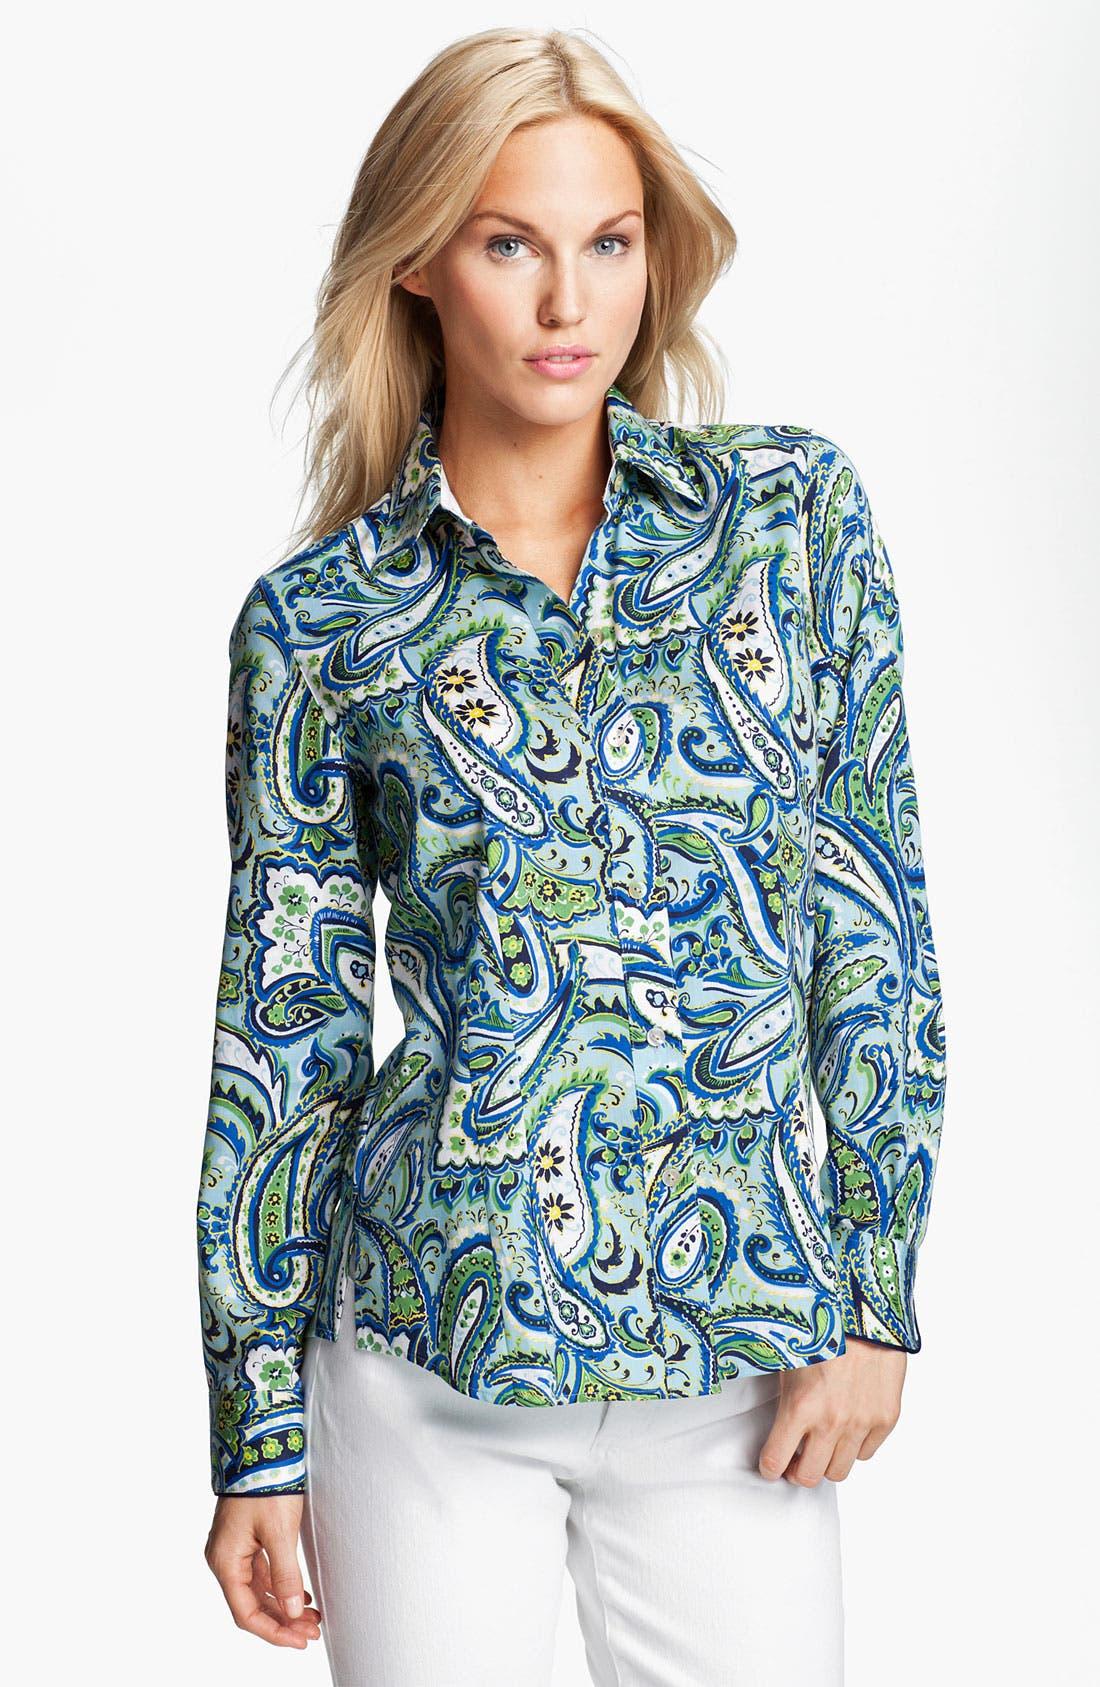 Alternate Image 1 Selected - Foxcroft 'Marina Paisley' Shirt (Petite)